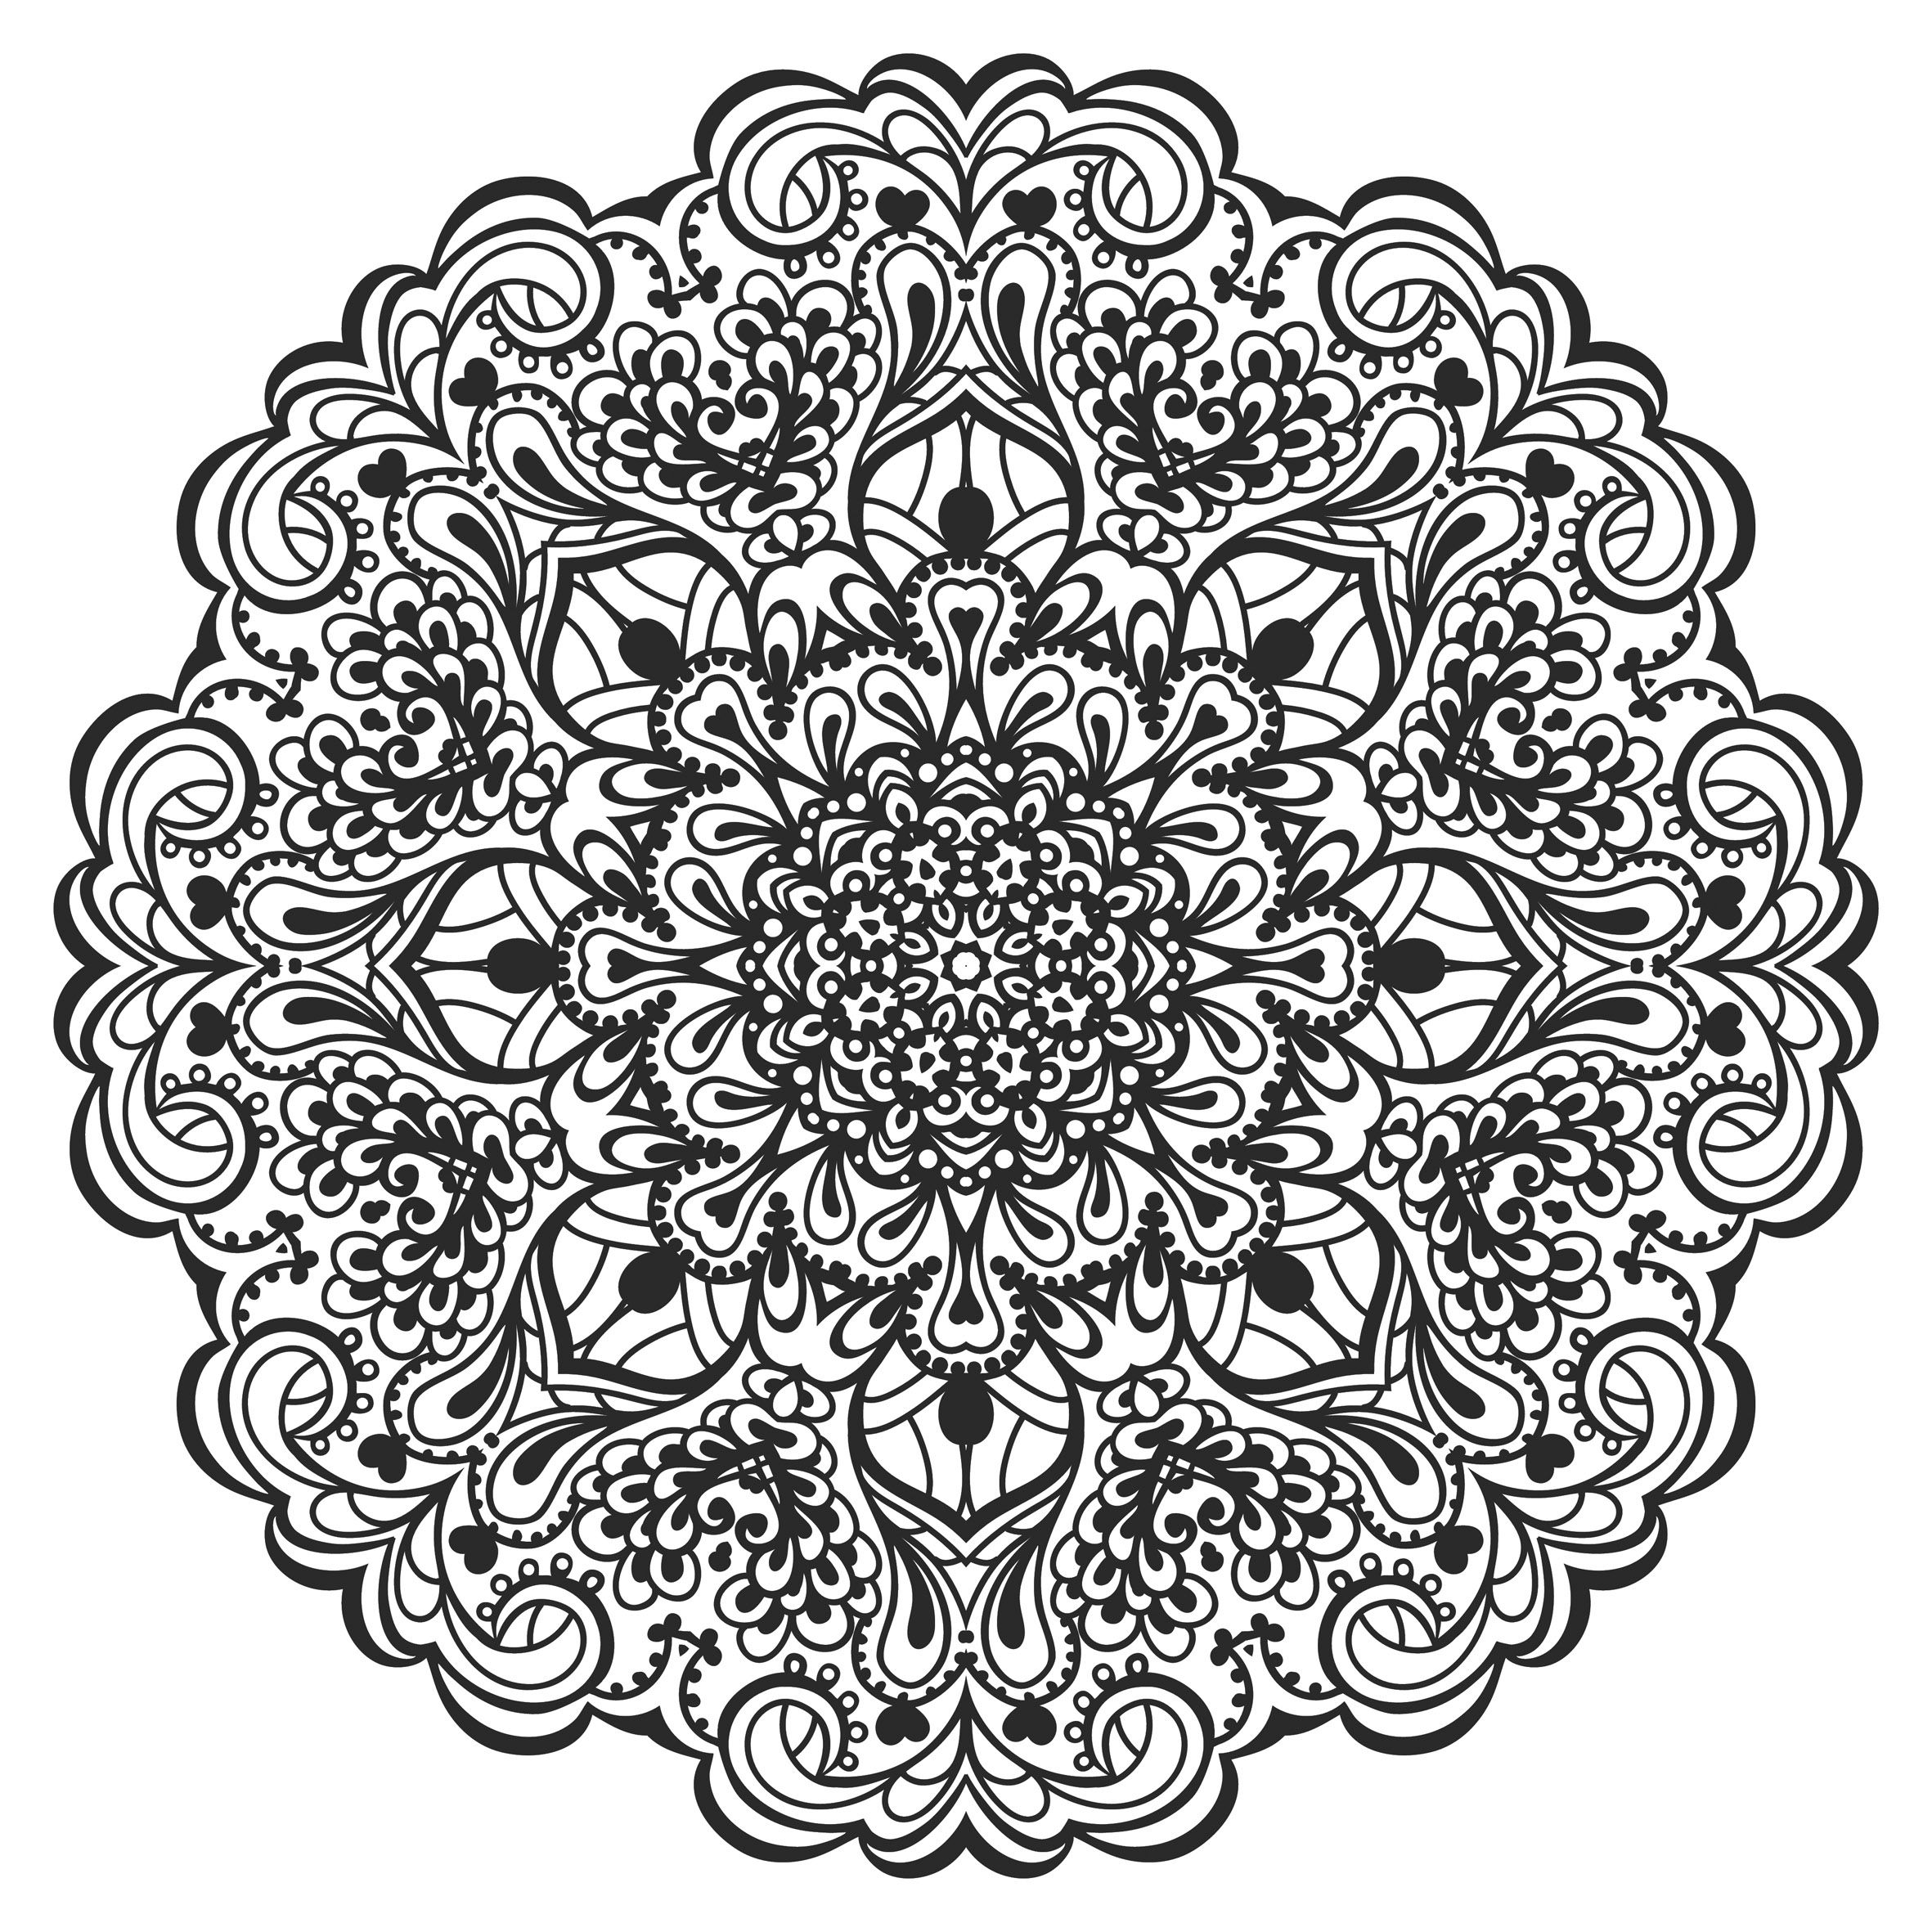 Lotus Flower Mandala To Color Bing Images Pinterest